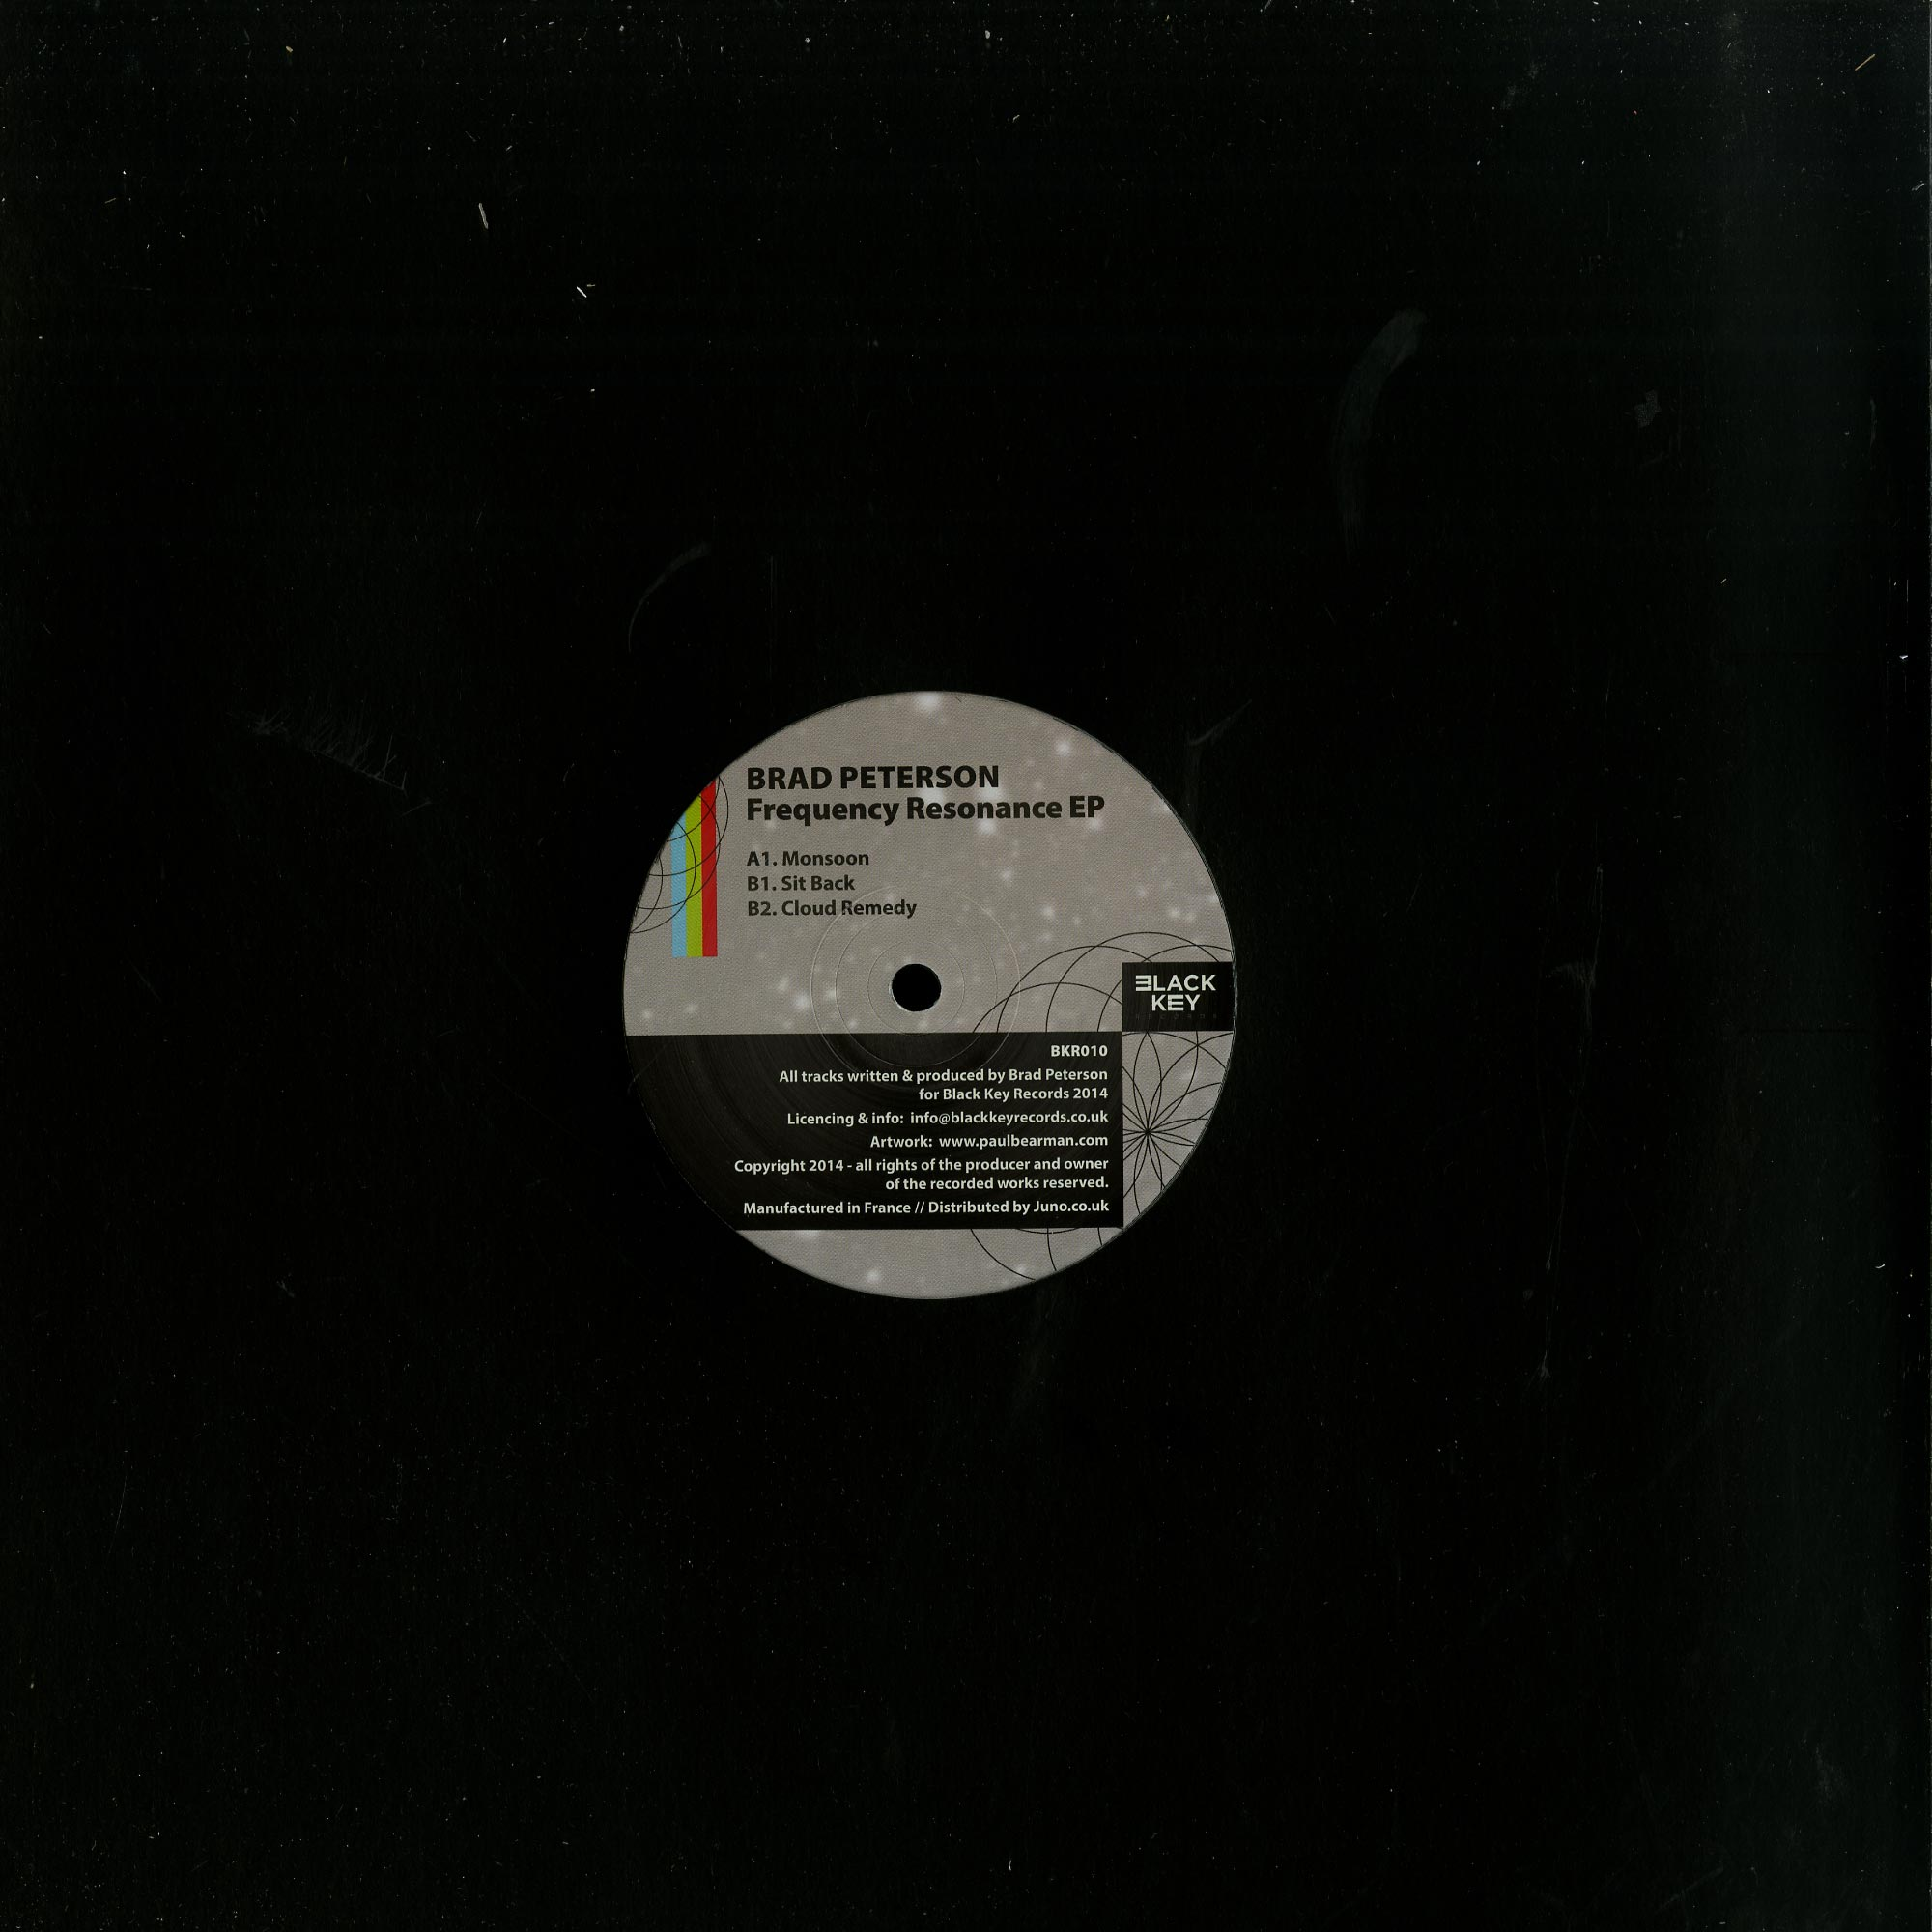 Brad Peterson - FREQUENCY RESONANCE EP